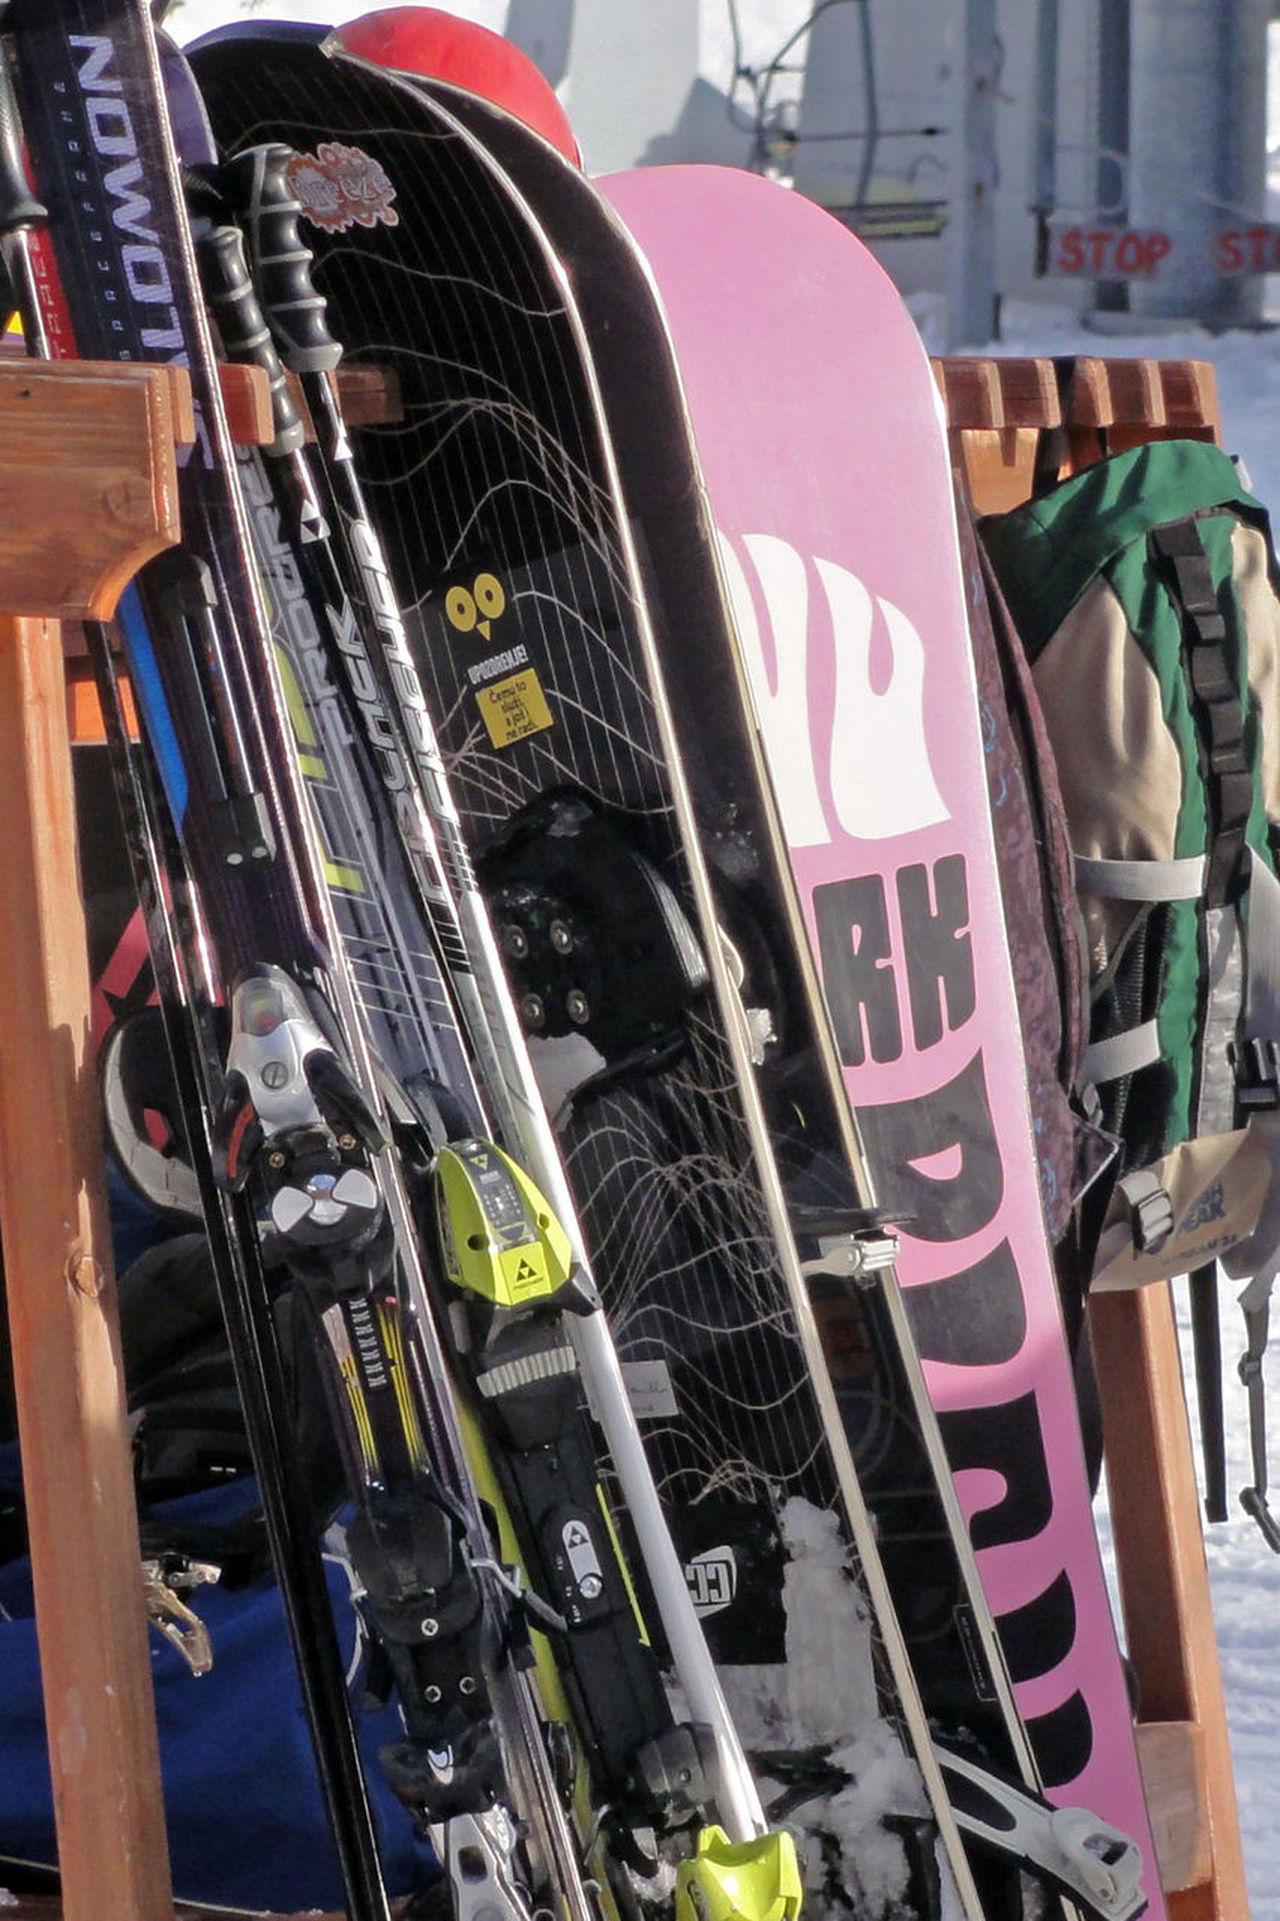 Holydays Krvavec Outdoors Ski Center Ski Destination Ski Resort  Snow Snowboard Snowboarding Travel Destinations Winter Winter Holidays